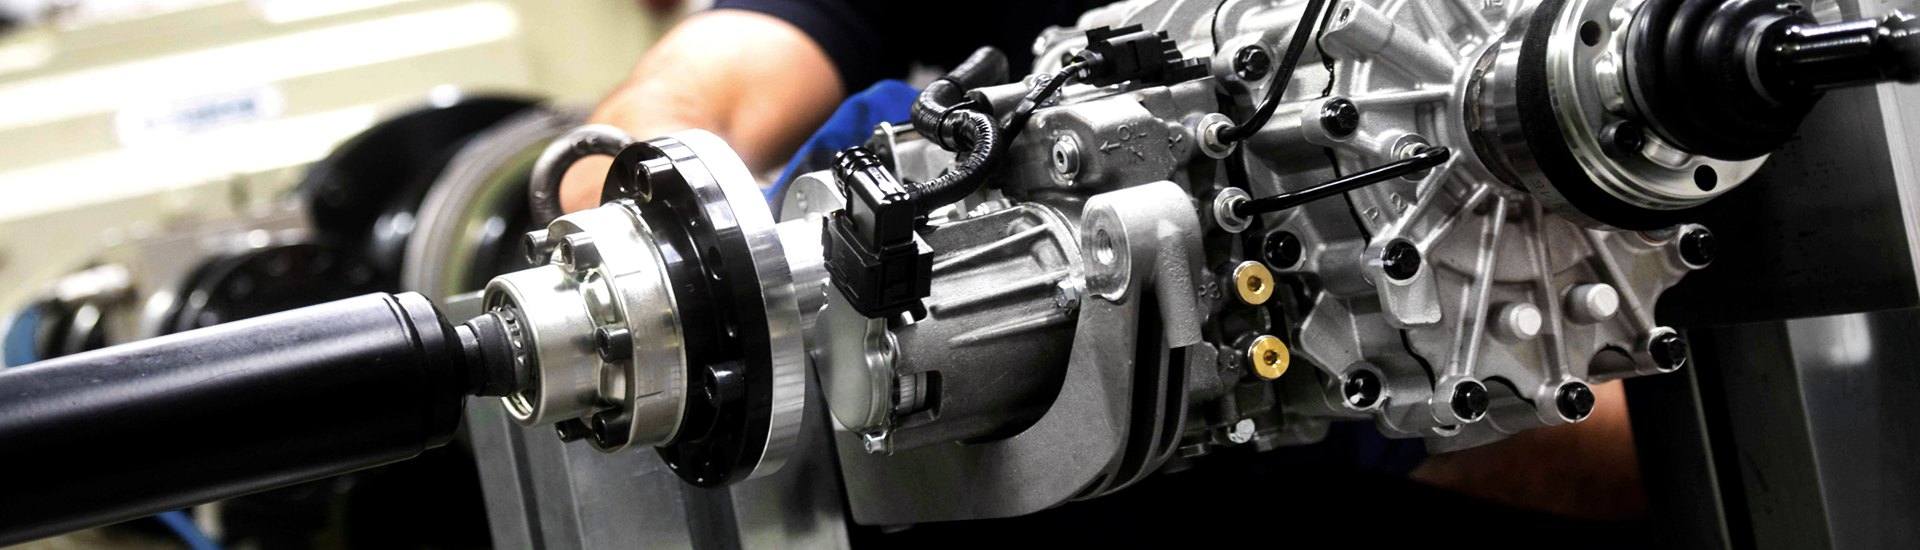 Driveline Parts | Axles, Hubs, CV-Joints, Driveshafts